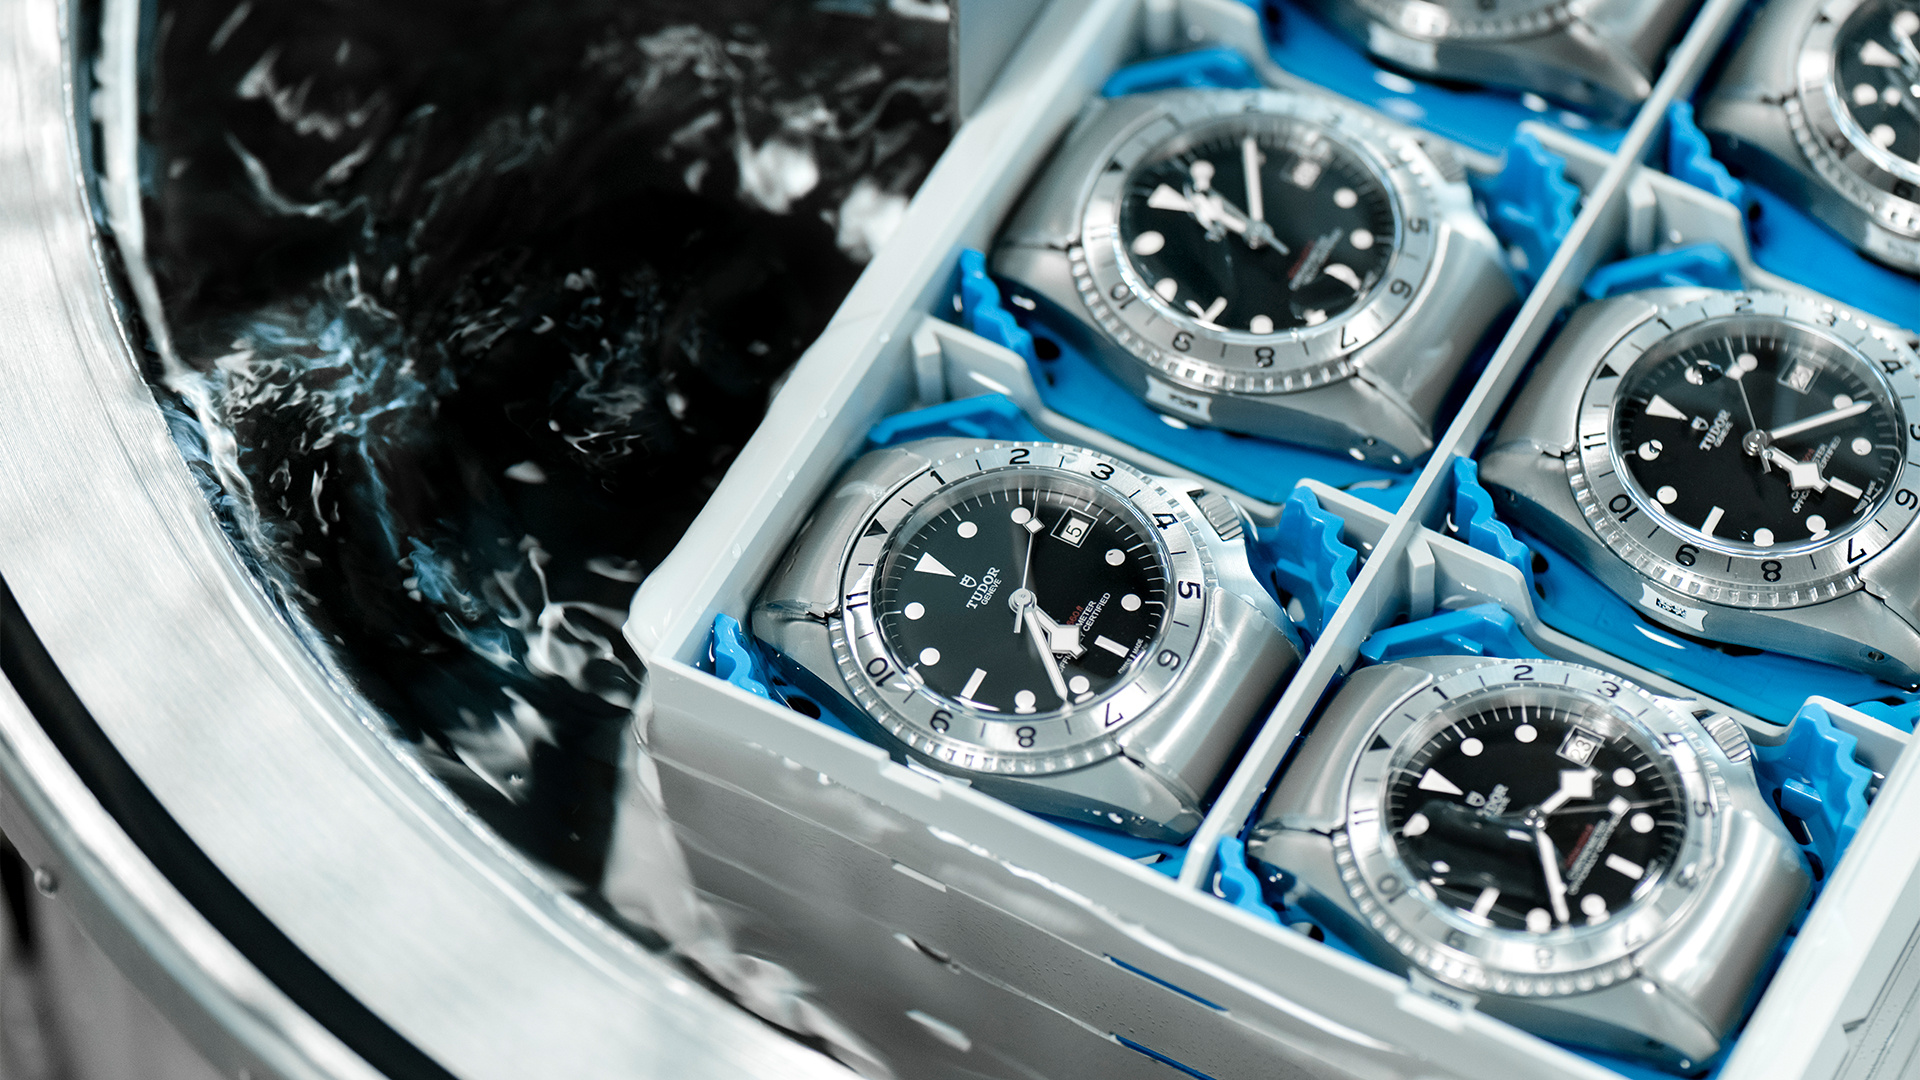 Tudor Watches manufacturer tour